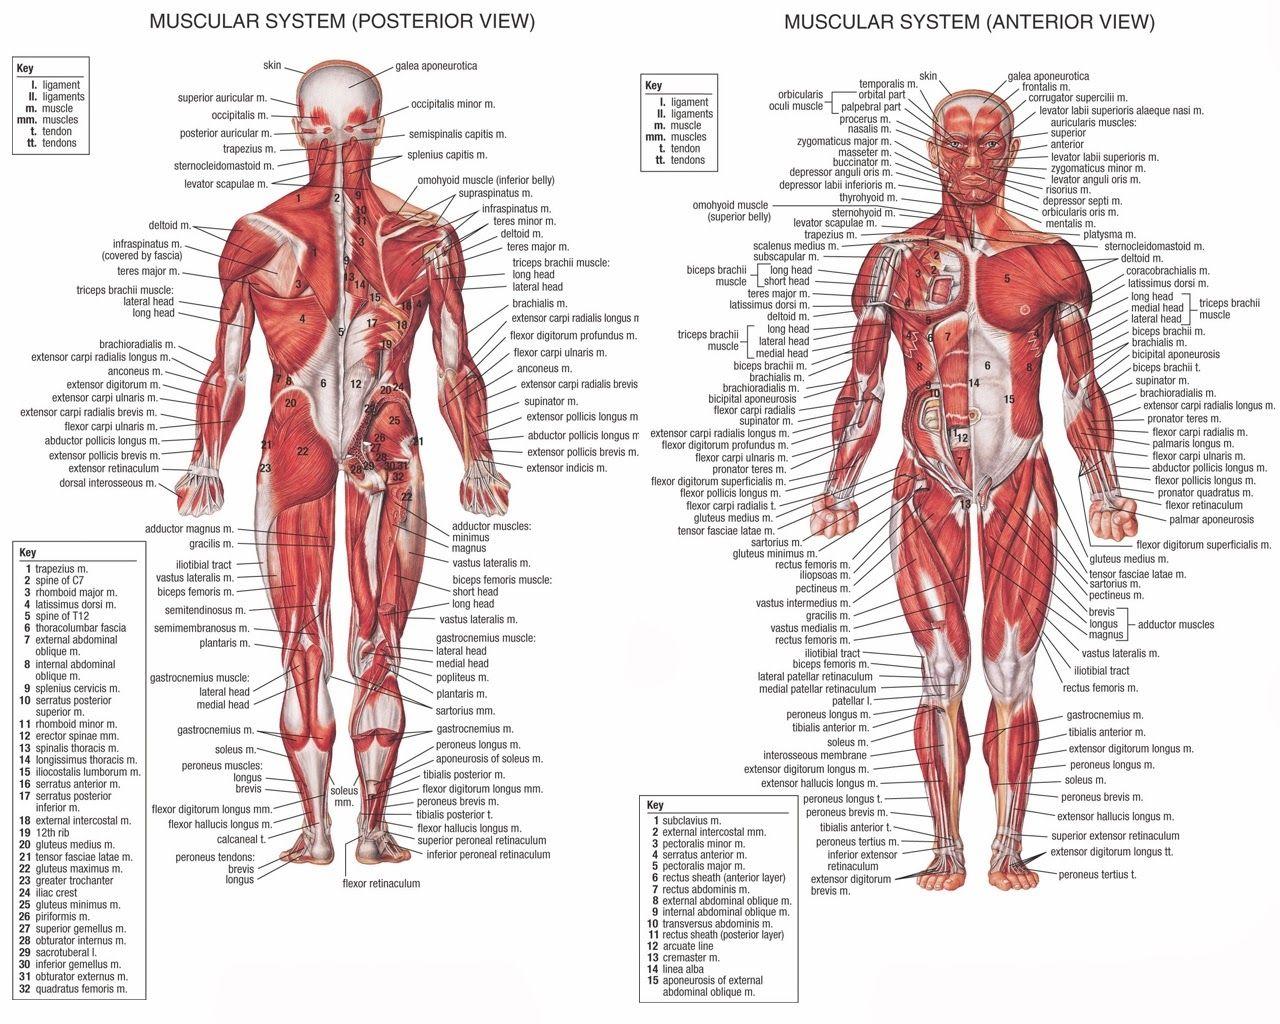 bones and muscles body chart tag human bones and muscles diagram human anatomy diagram [ 1280 x 1024 Pixel ]